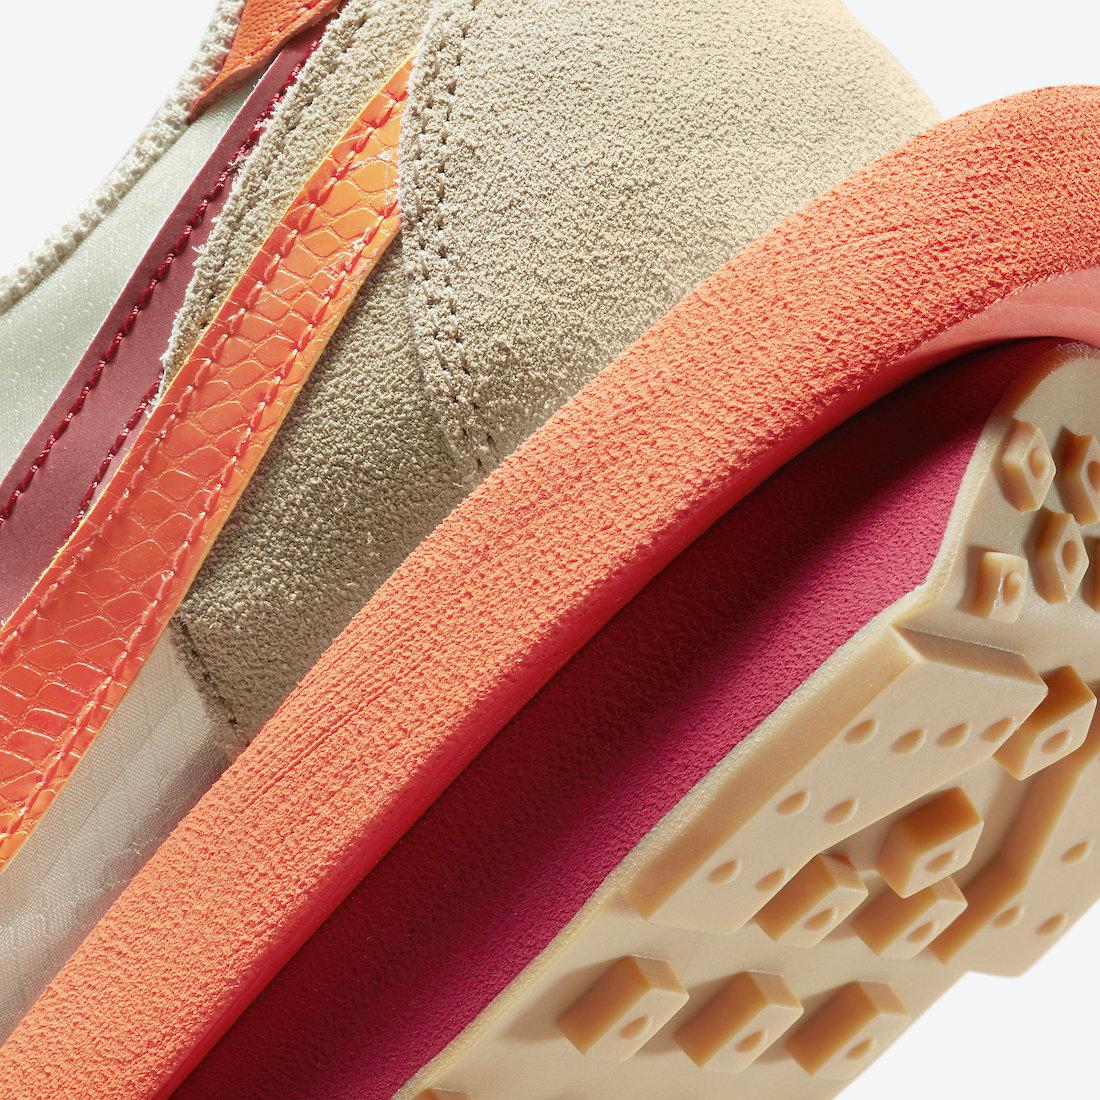 Clot-Sacai-Nike-LDWaffle-Orange-Blaze-DH1347-100-Release-Date-7